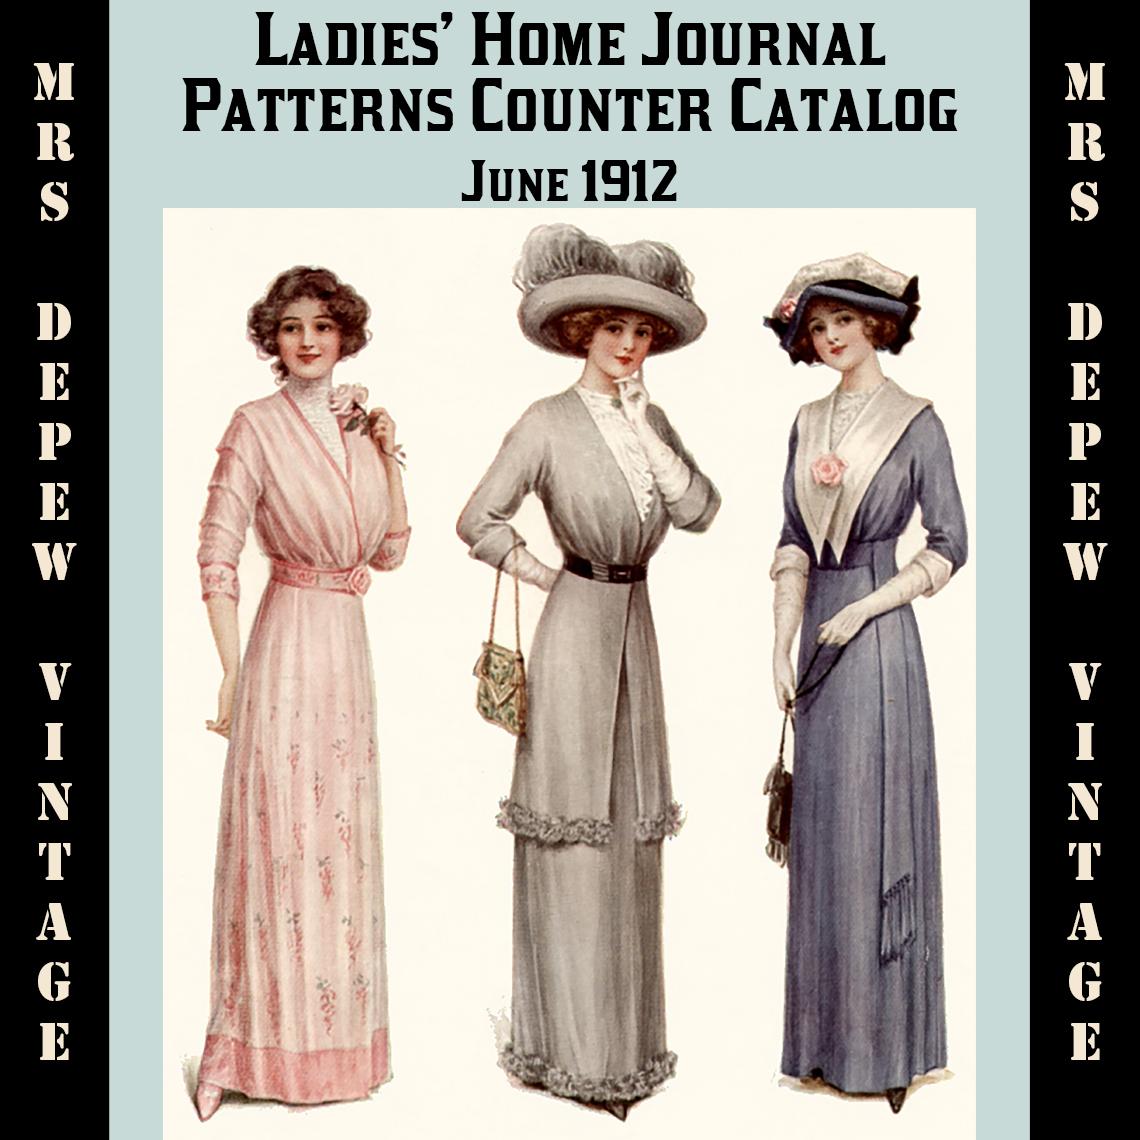 Ladies Home Journal Patterns Counter Catalog Summer 1912